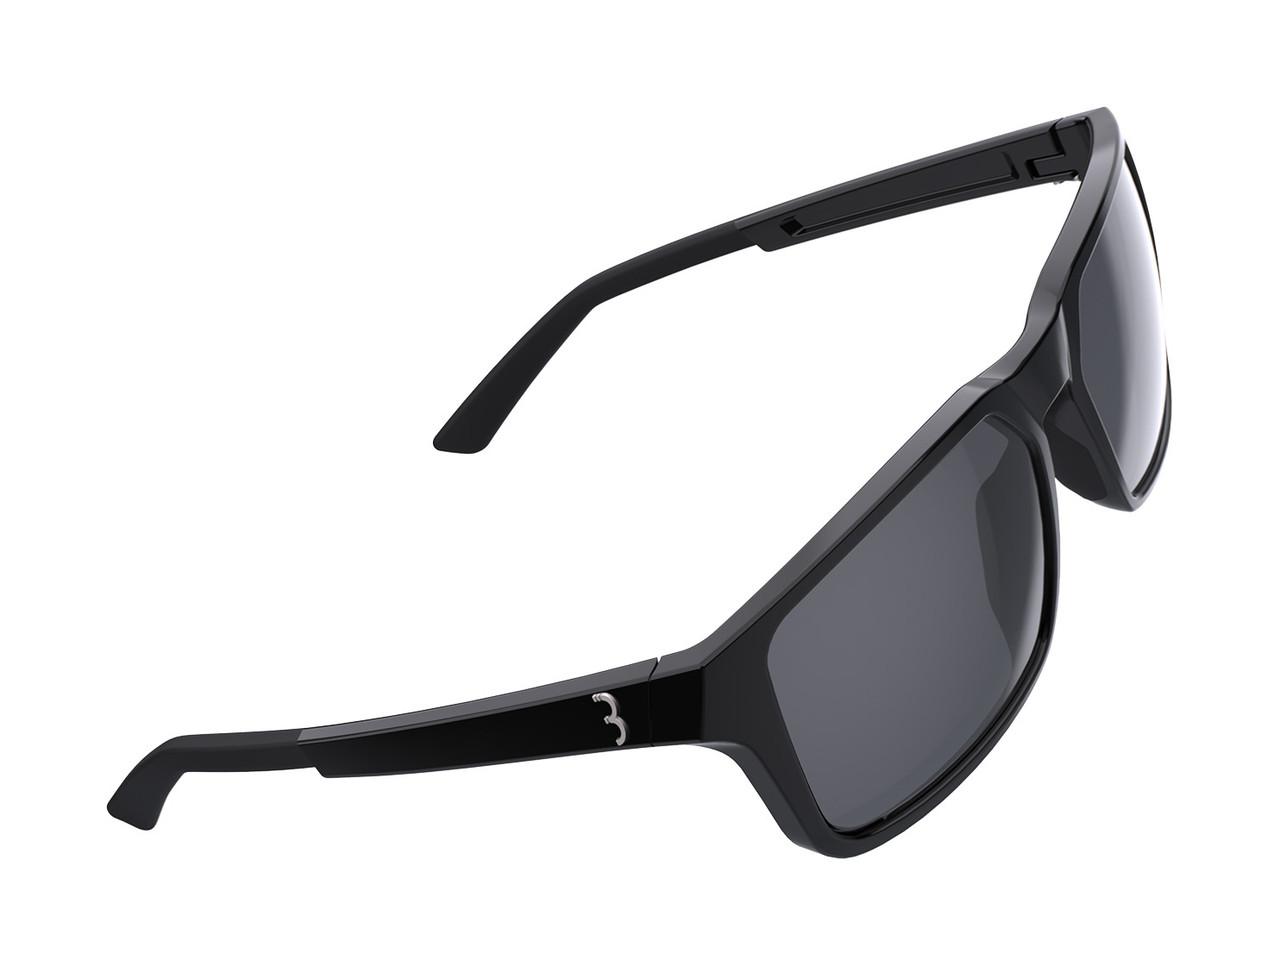 BBB Spectre Sport BSG-66 Sunglasses Matte Black / Smoke Lens